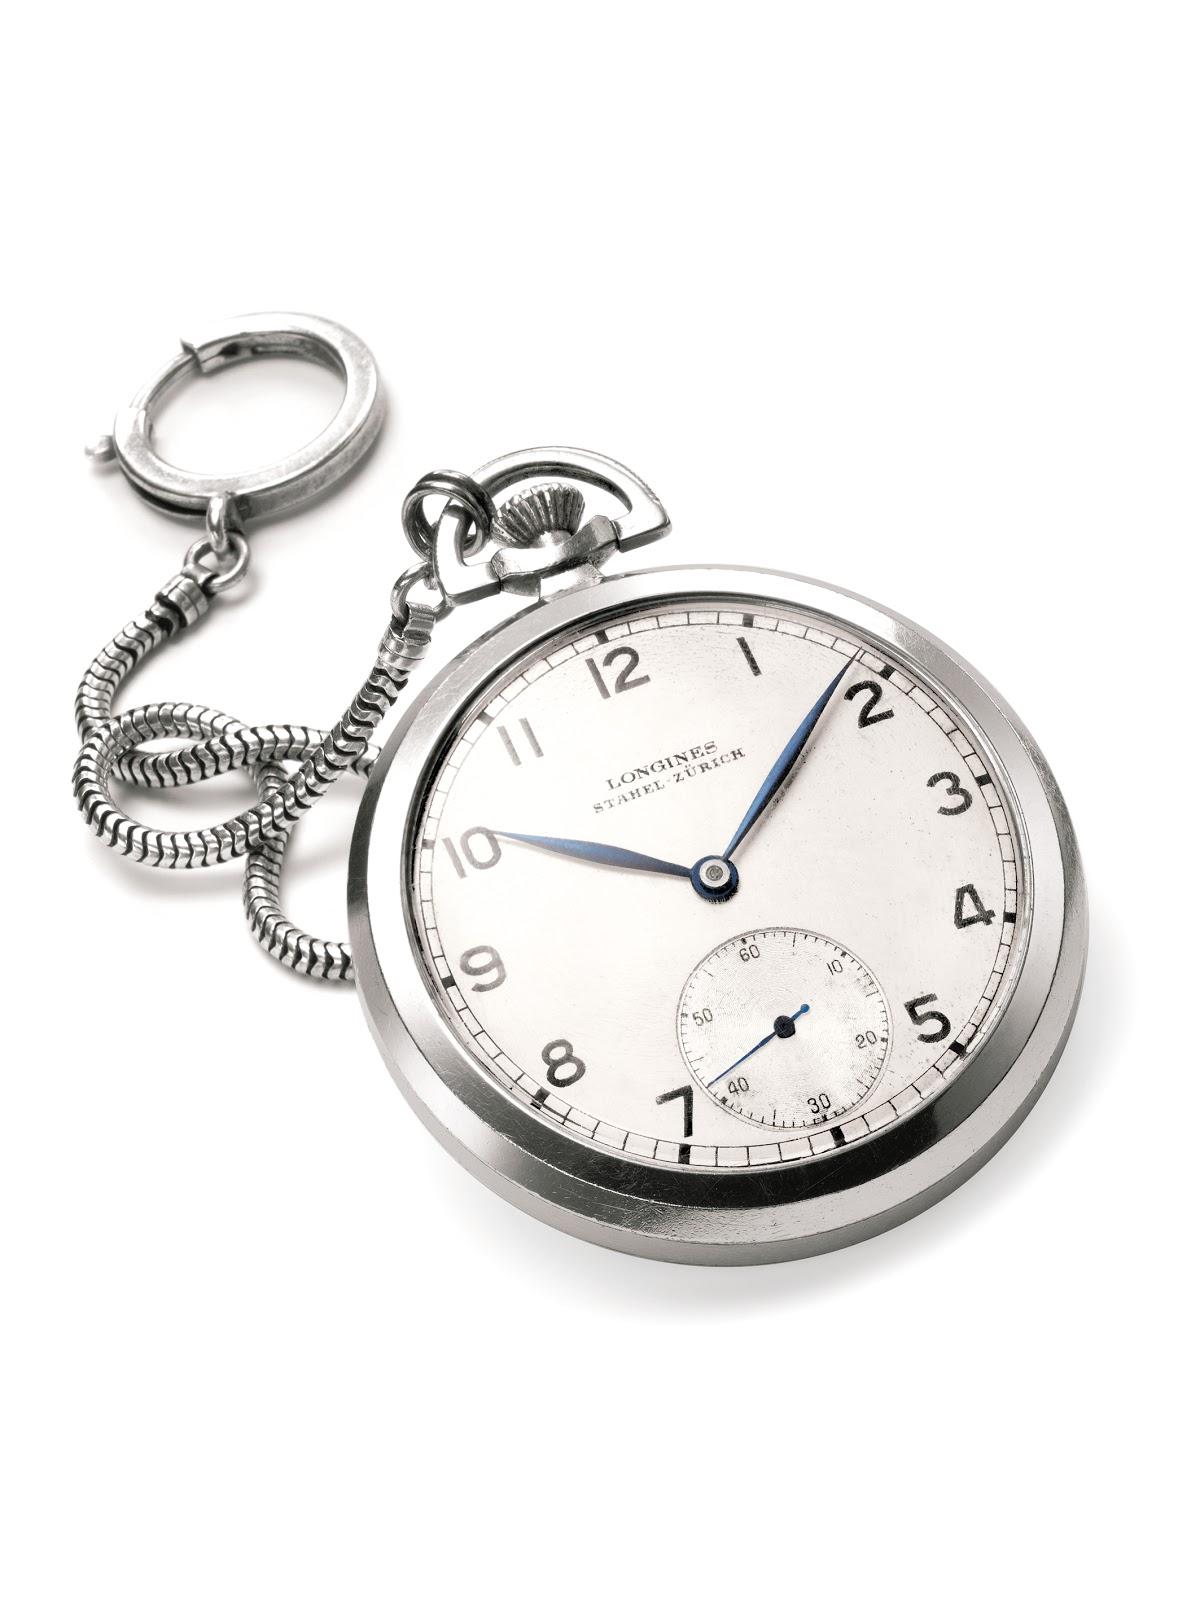 http://4.bp.blogspot.com/-Wz43RhtyvyA/Ta26UxzekRI/AAAAAAAABbc/gCVKXmB2m4c/s1600/Longines_Pocket_Watch.jpg